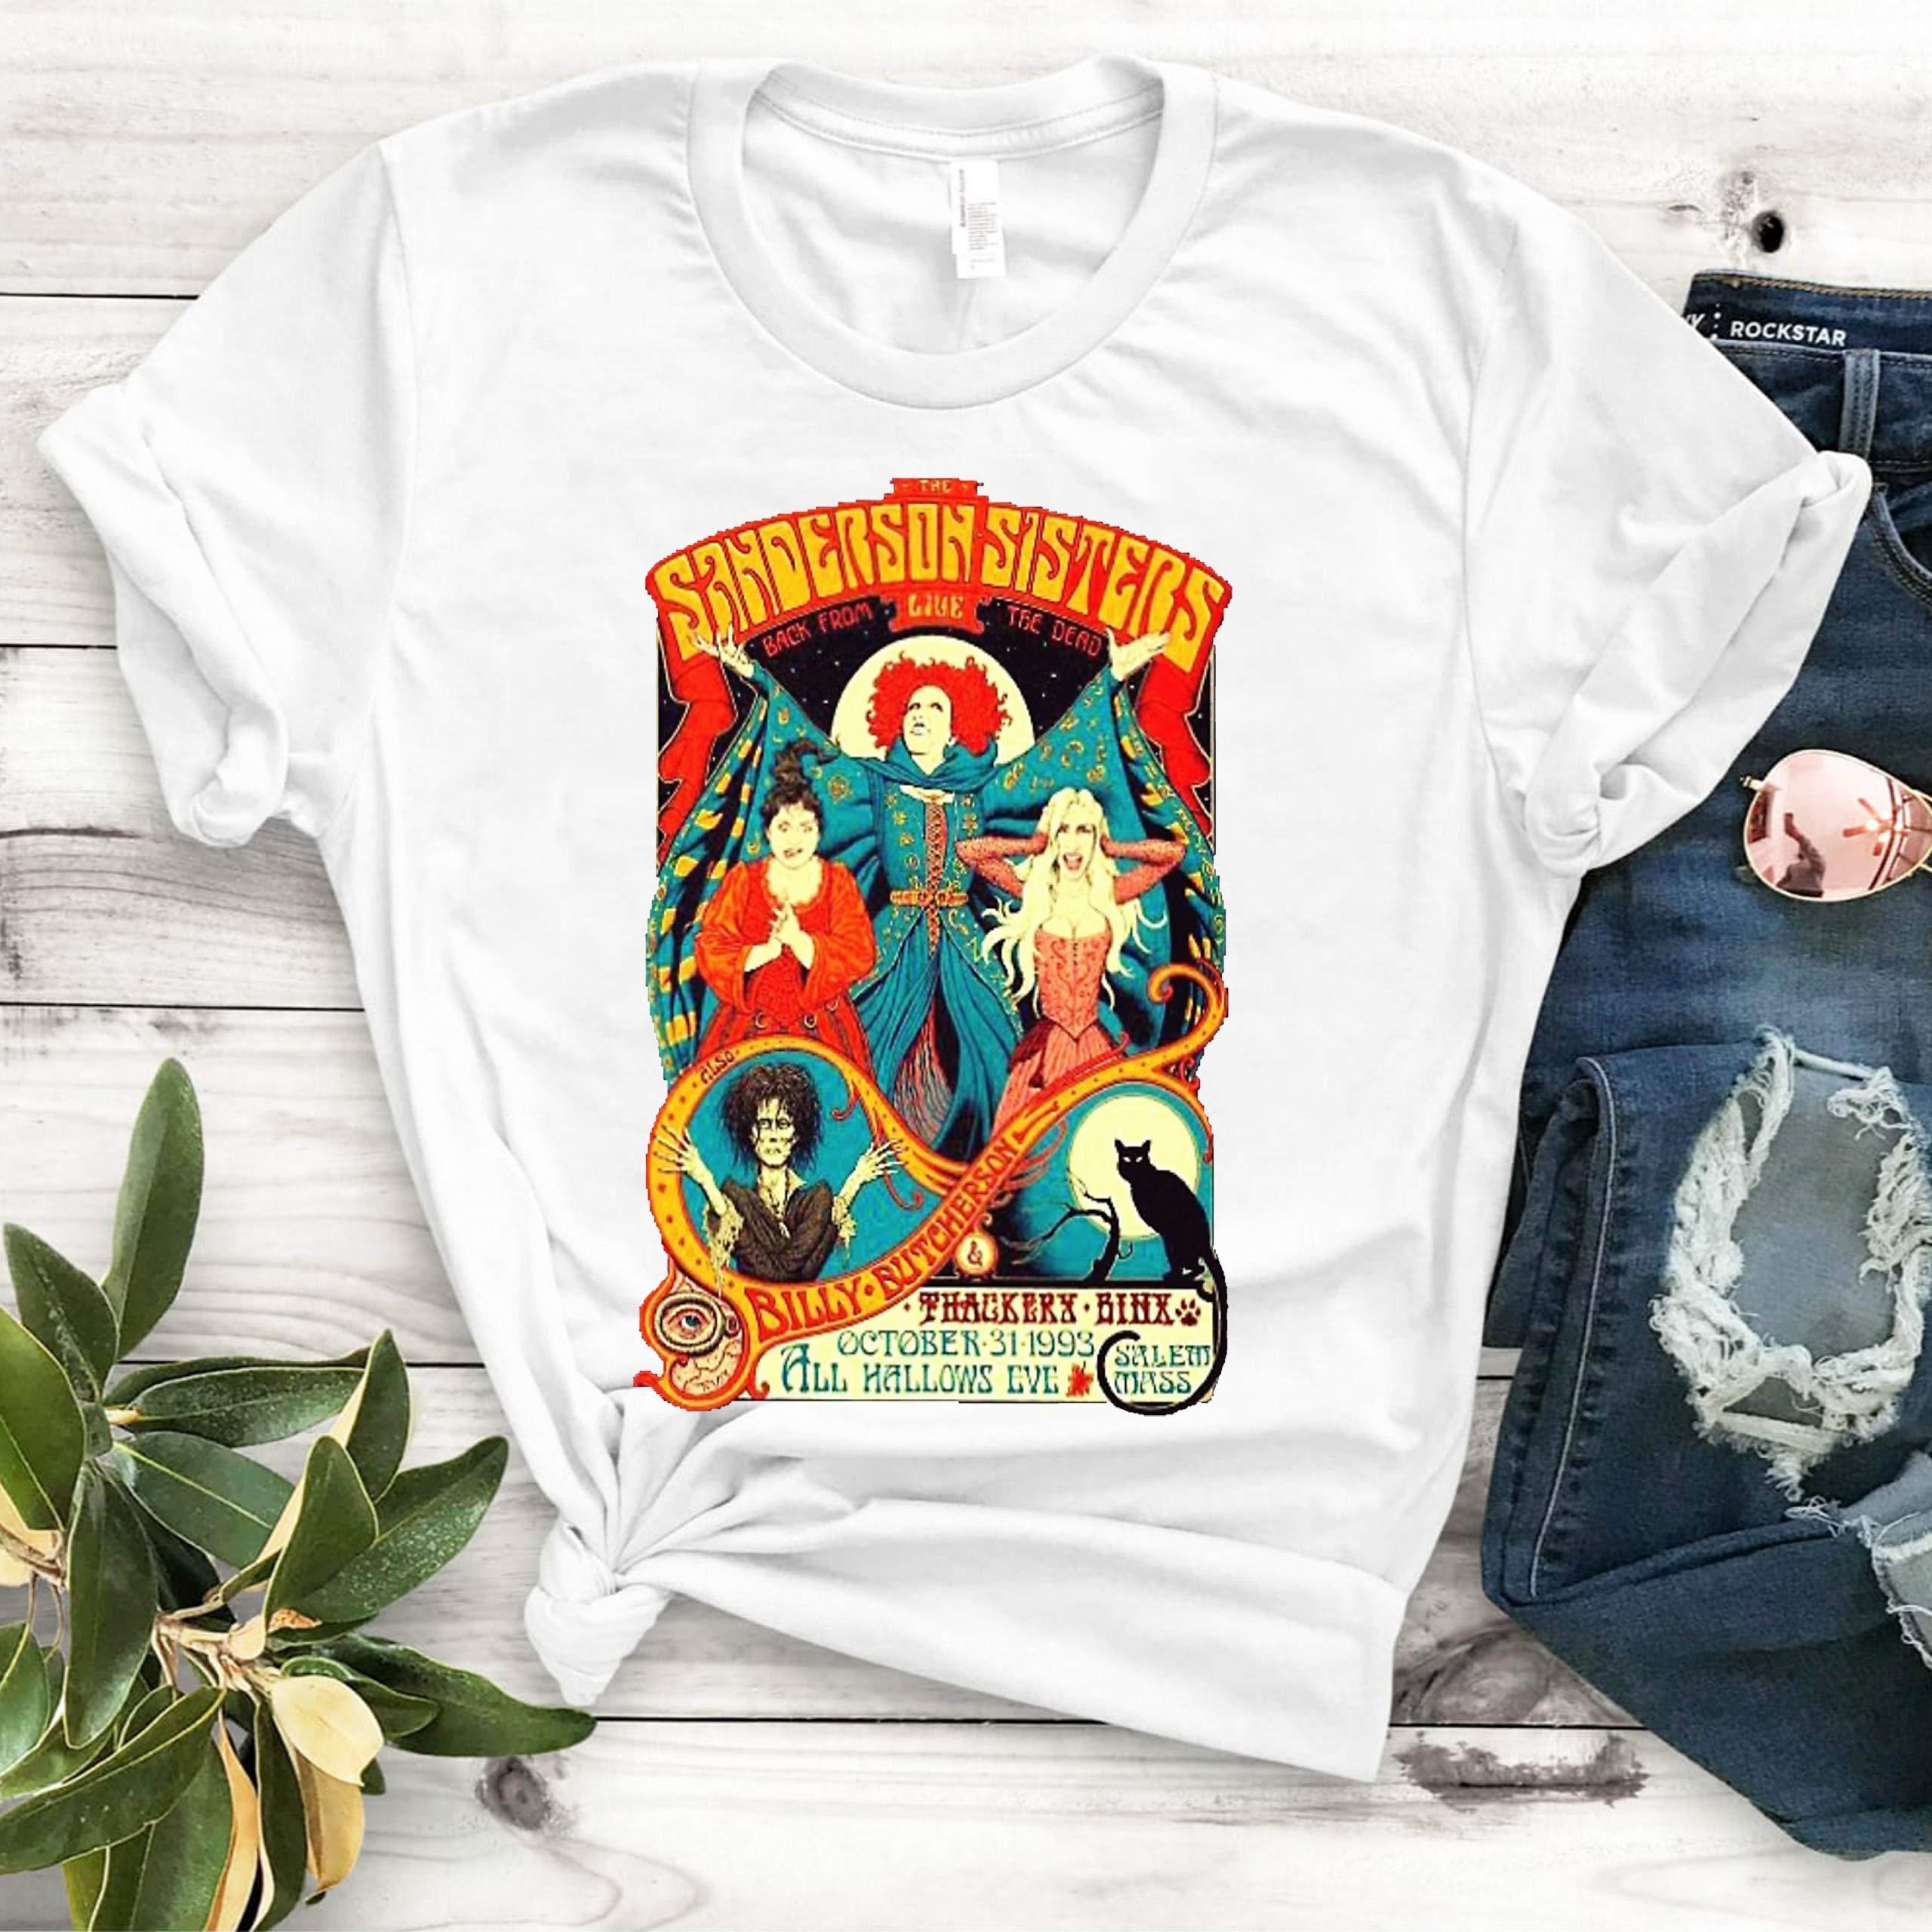 Sanderson Sisters Vintage Tour Poster For Woman Shirts